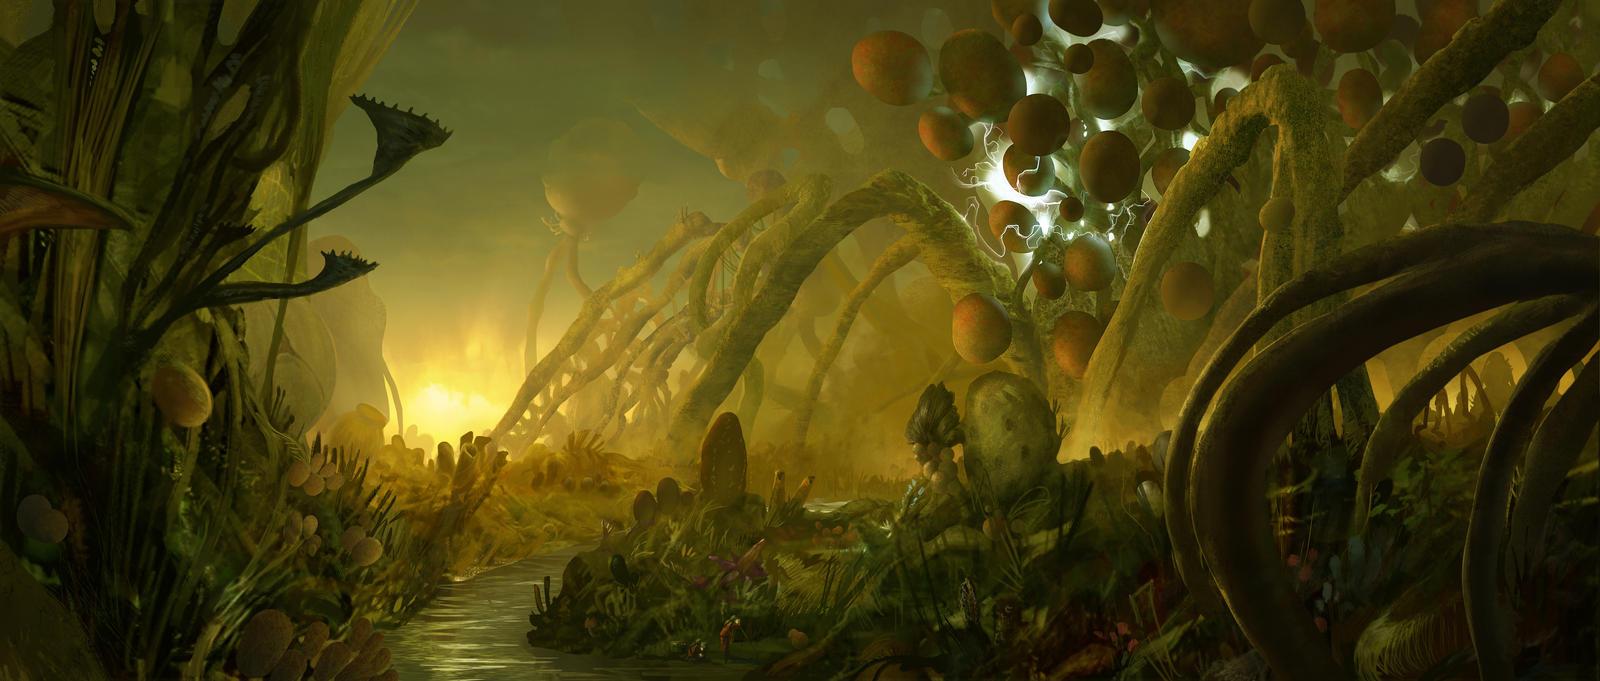 sci fi landscape alien planets - photo #43